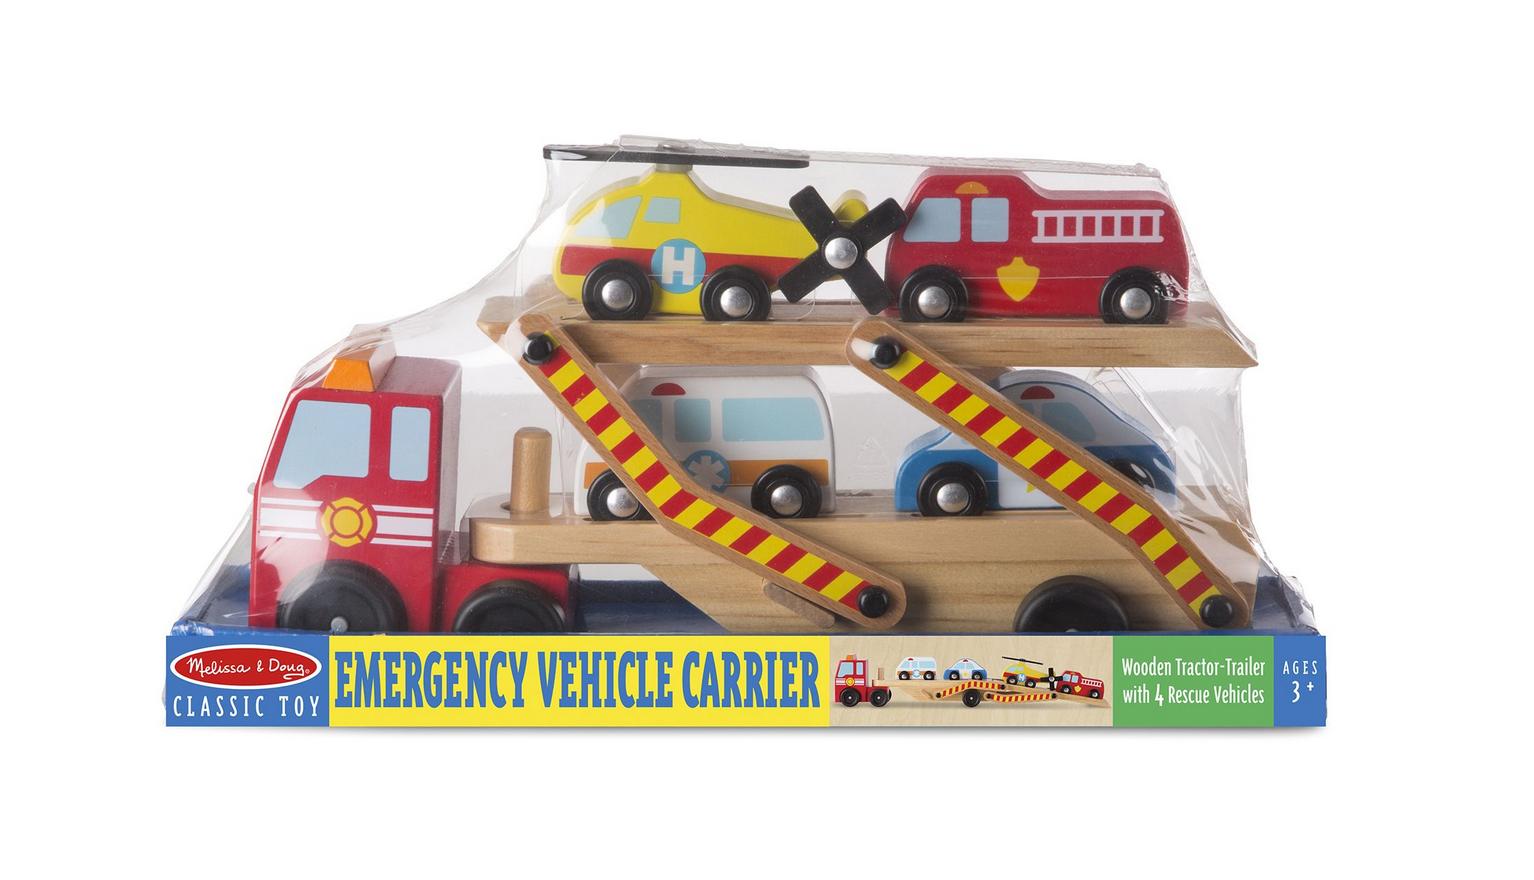 Melissa & Doug Emergency Vehicle Carrier 4610